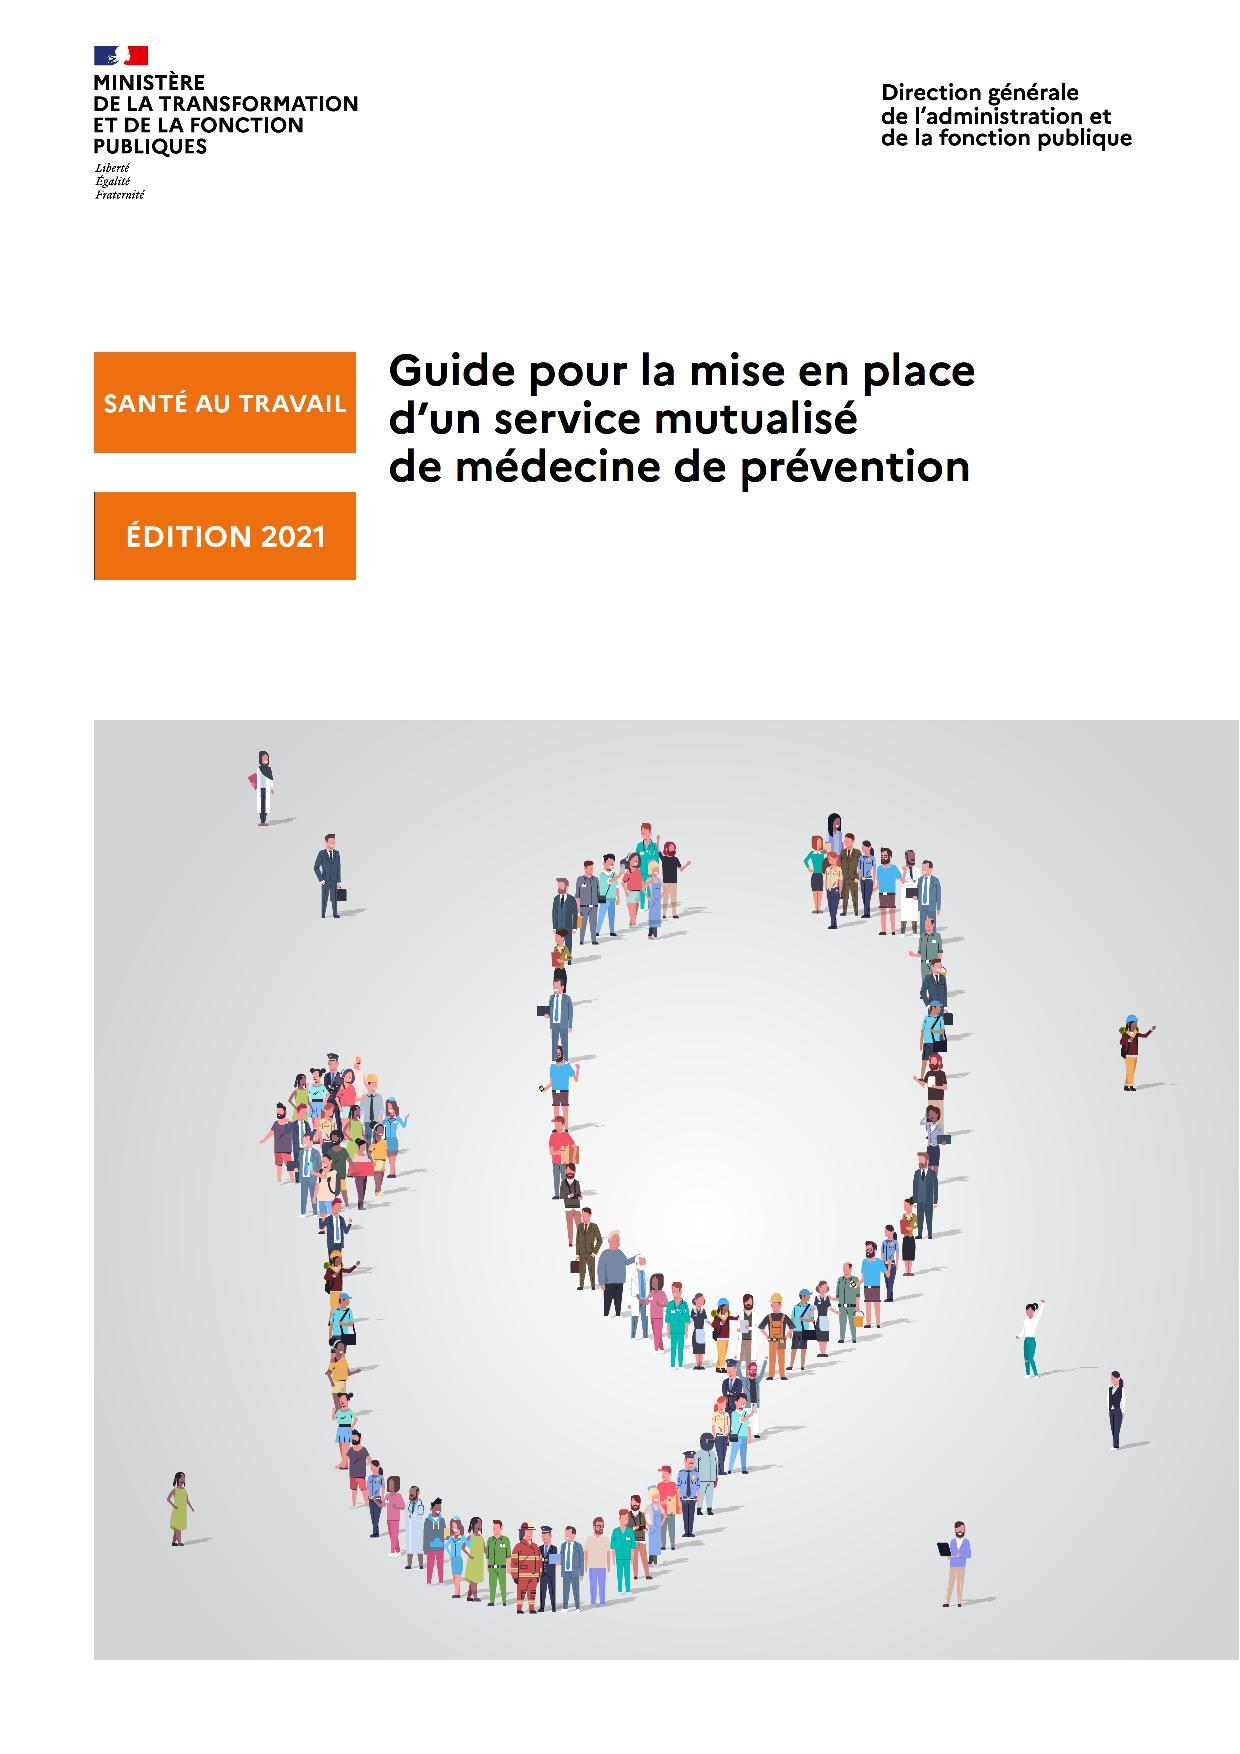 guide_mutualisation_service_medecine_prevention